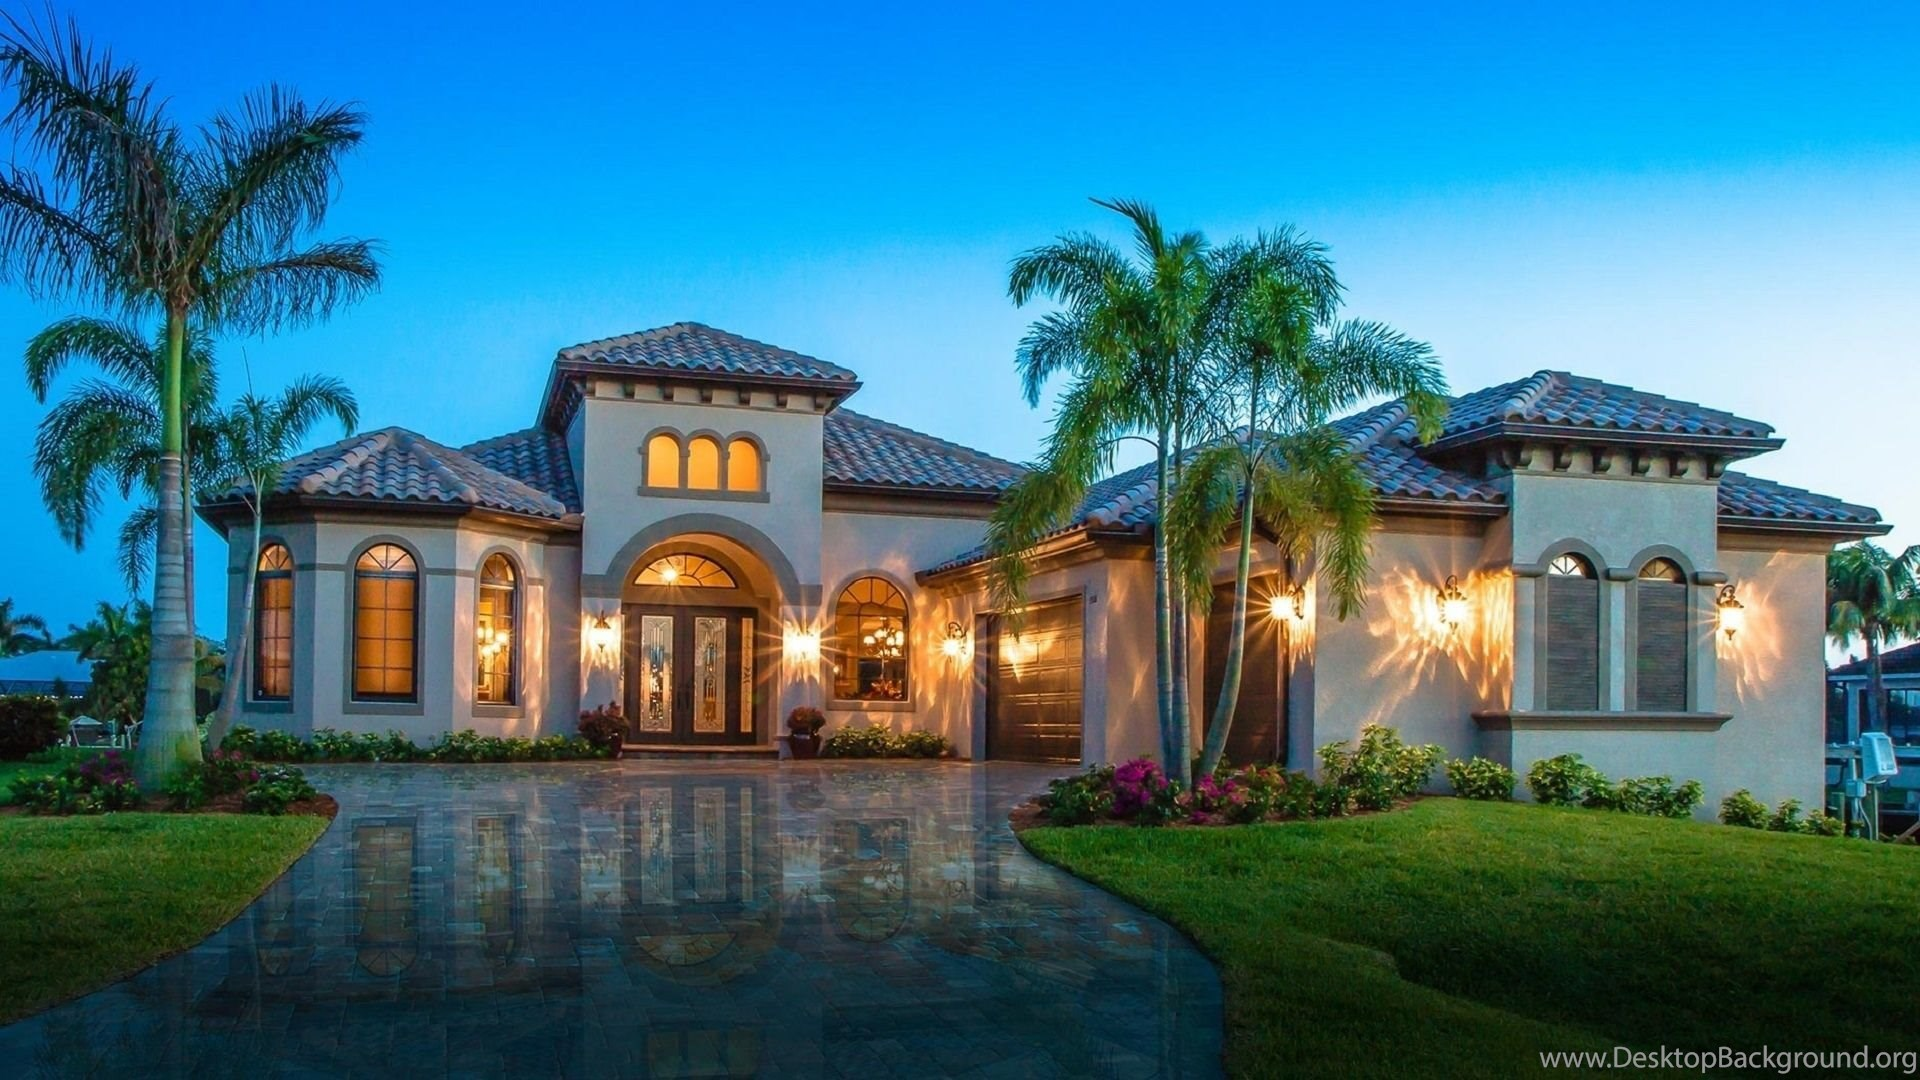 1920x1080 Florida, Homes, Luxury Homes, Florida Luxury Home ...